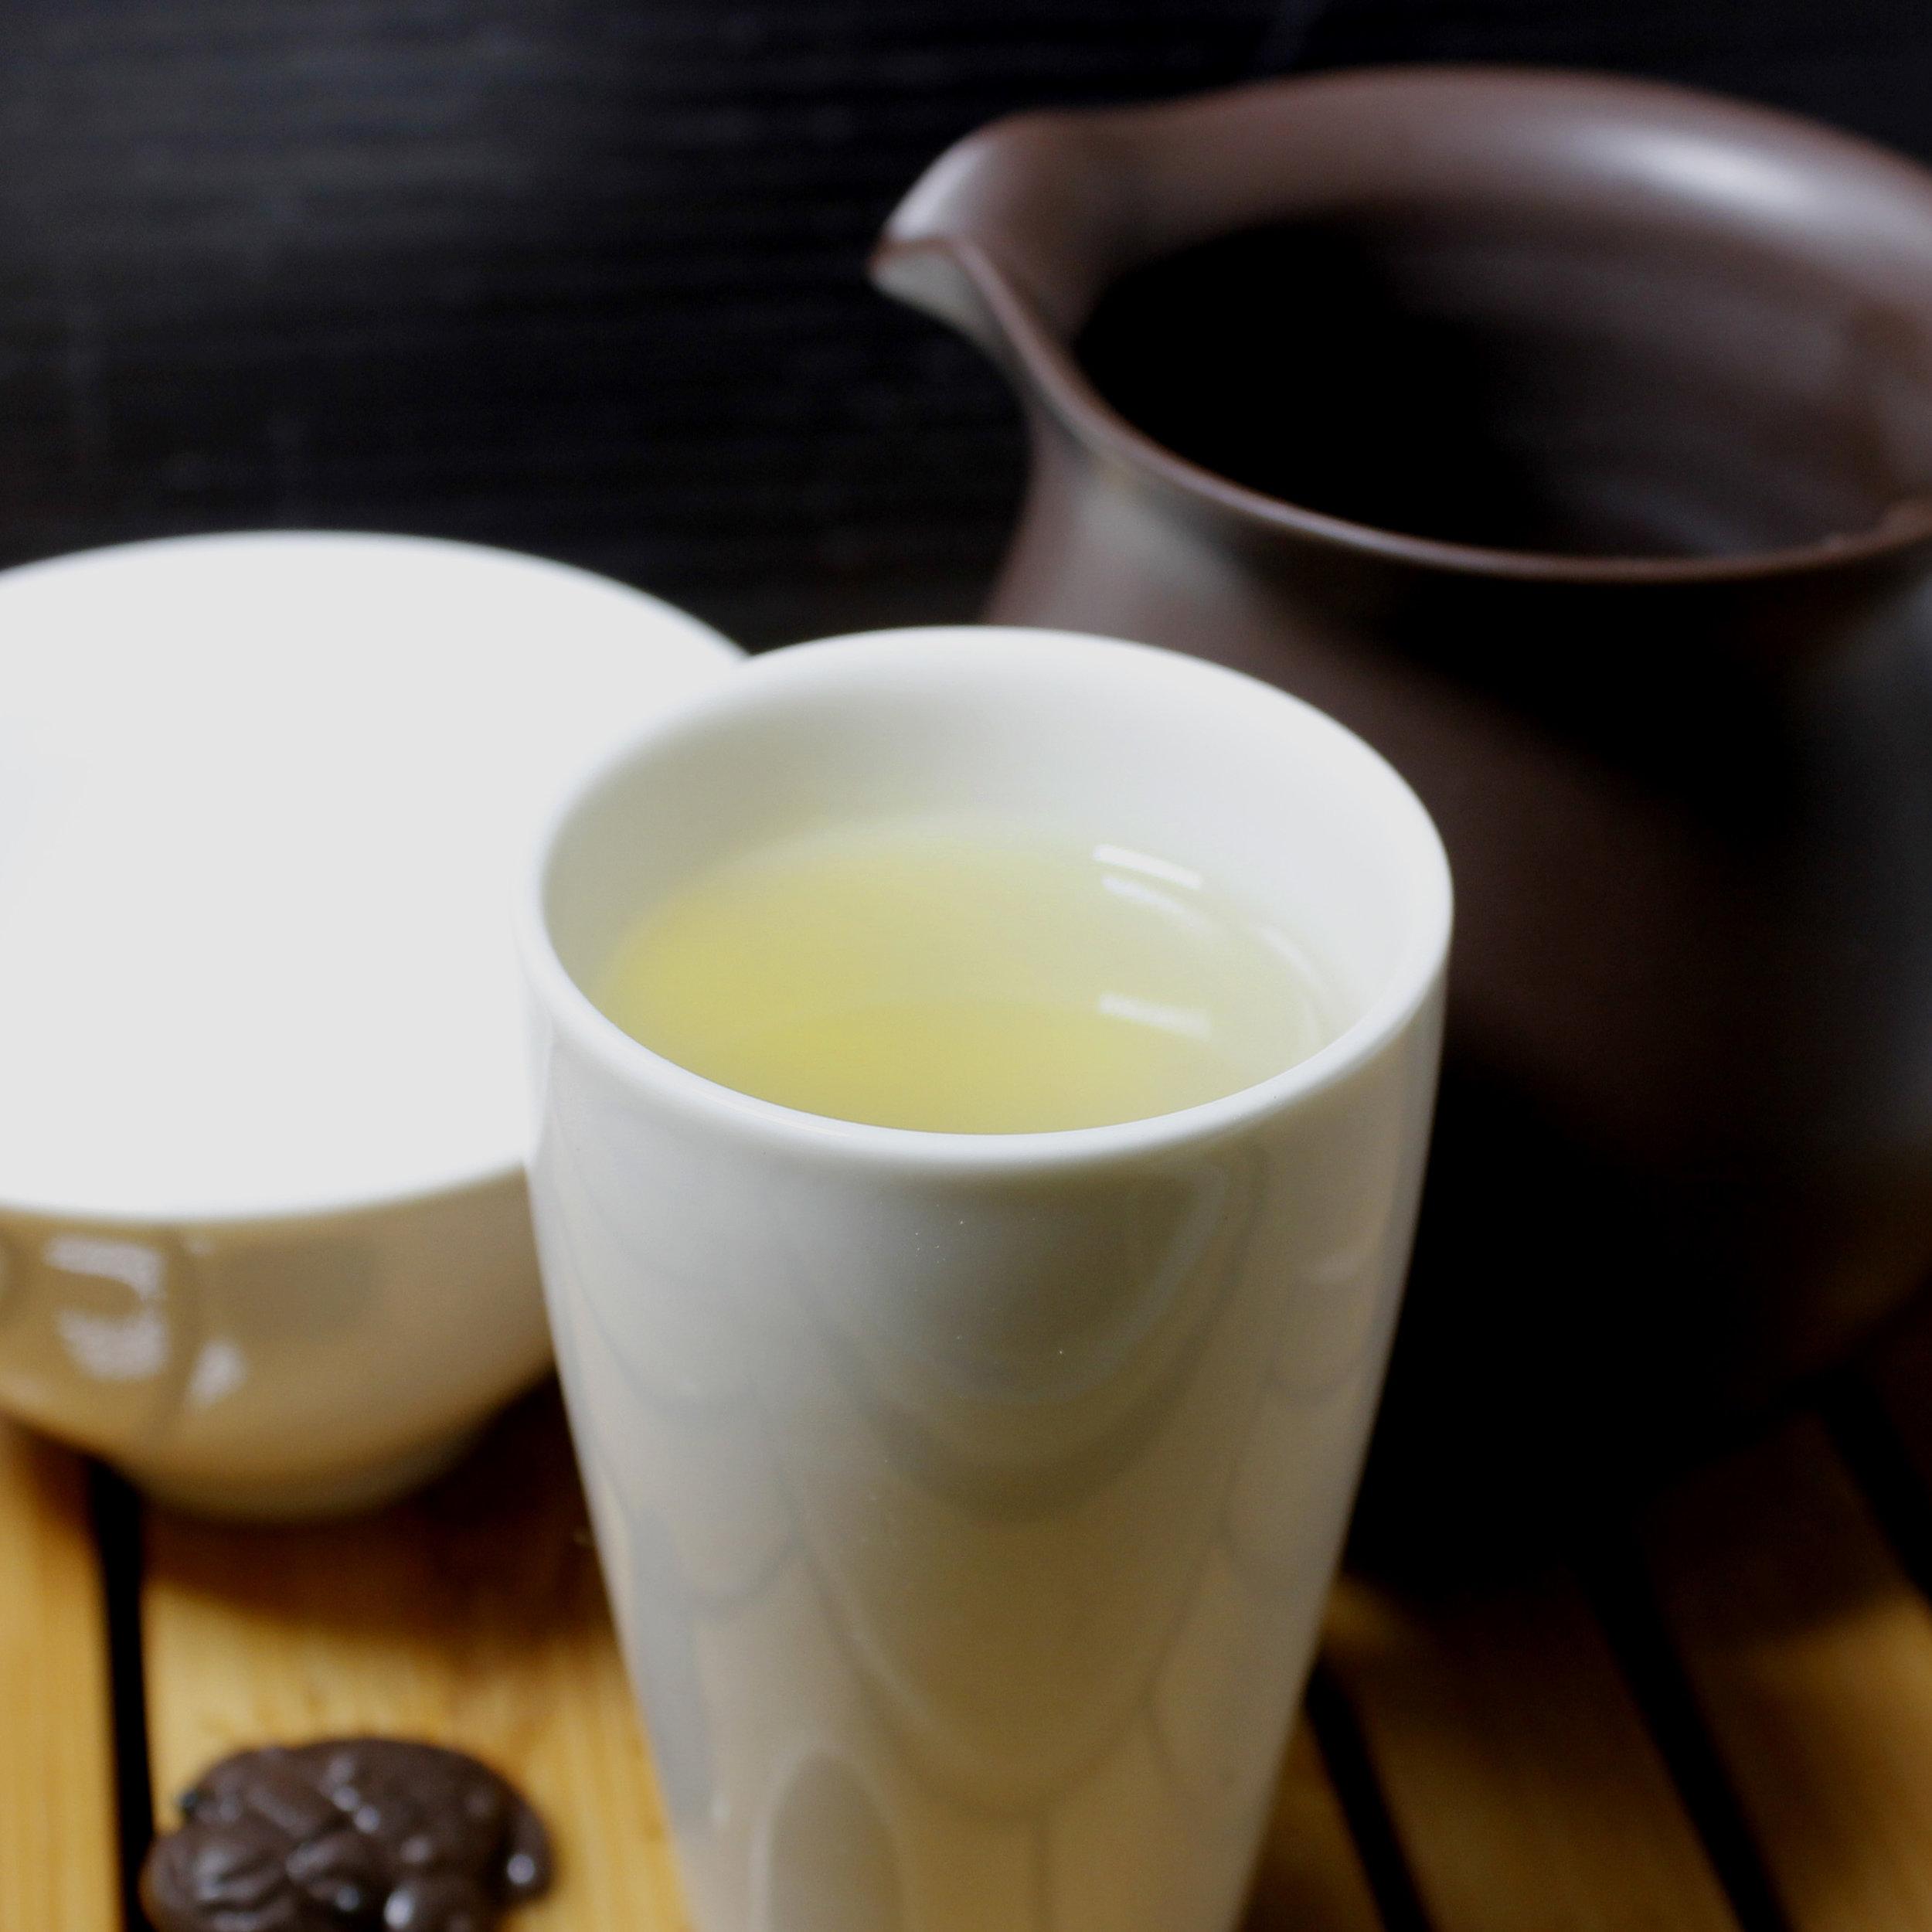 shan-lin-xi-oolong-whole-leaf-loose-tea-itw3-2019a.jpg